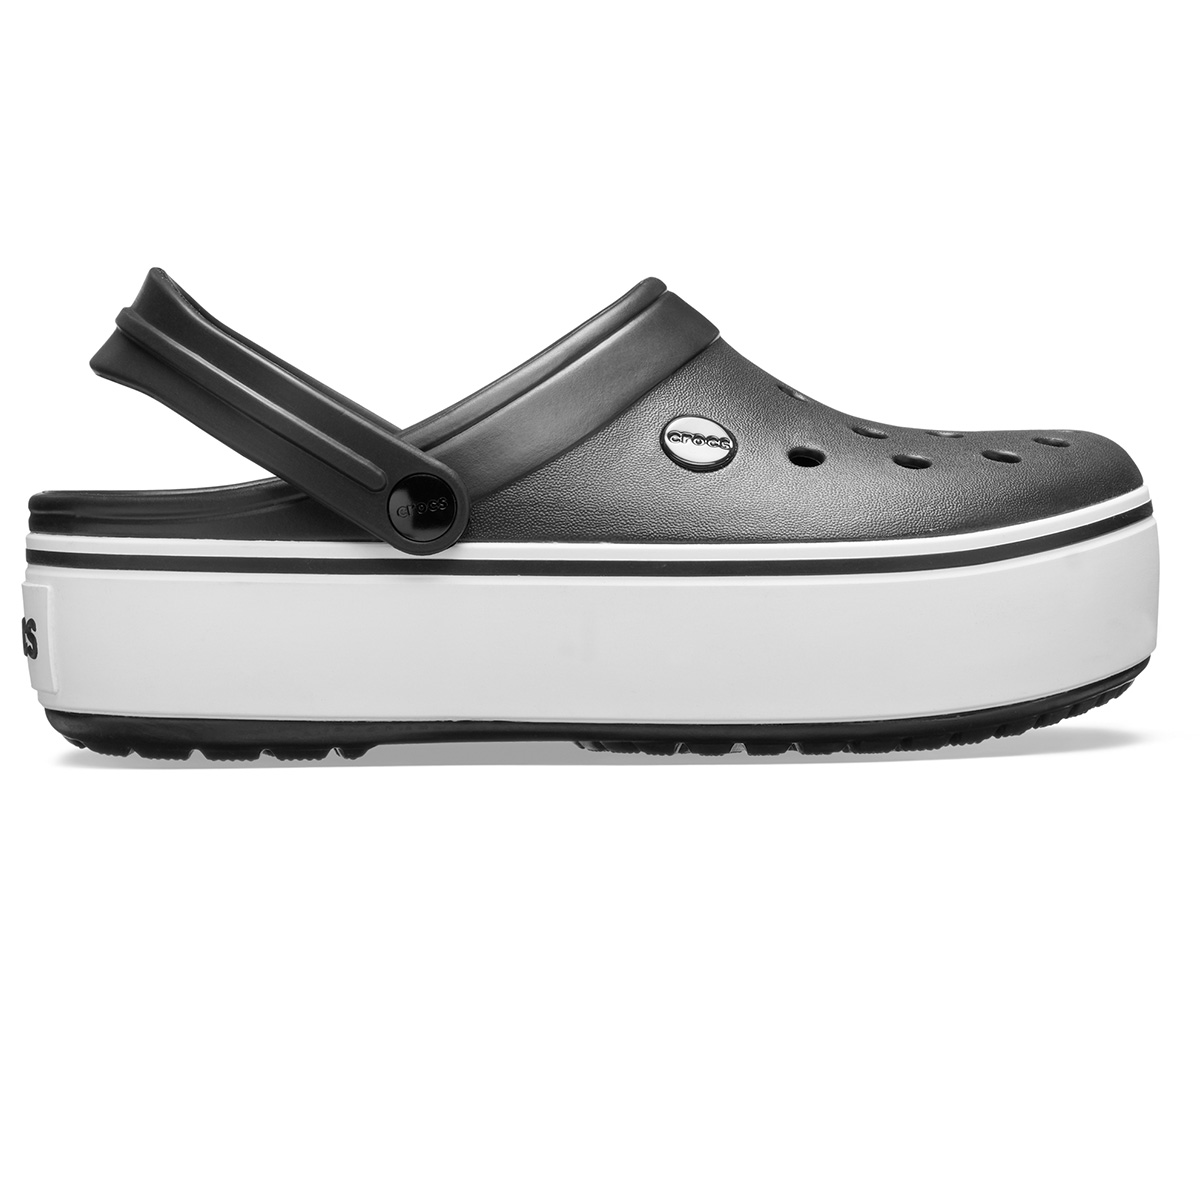 Crocs Crocband Platform Clog - Siyah/Beyaz